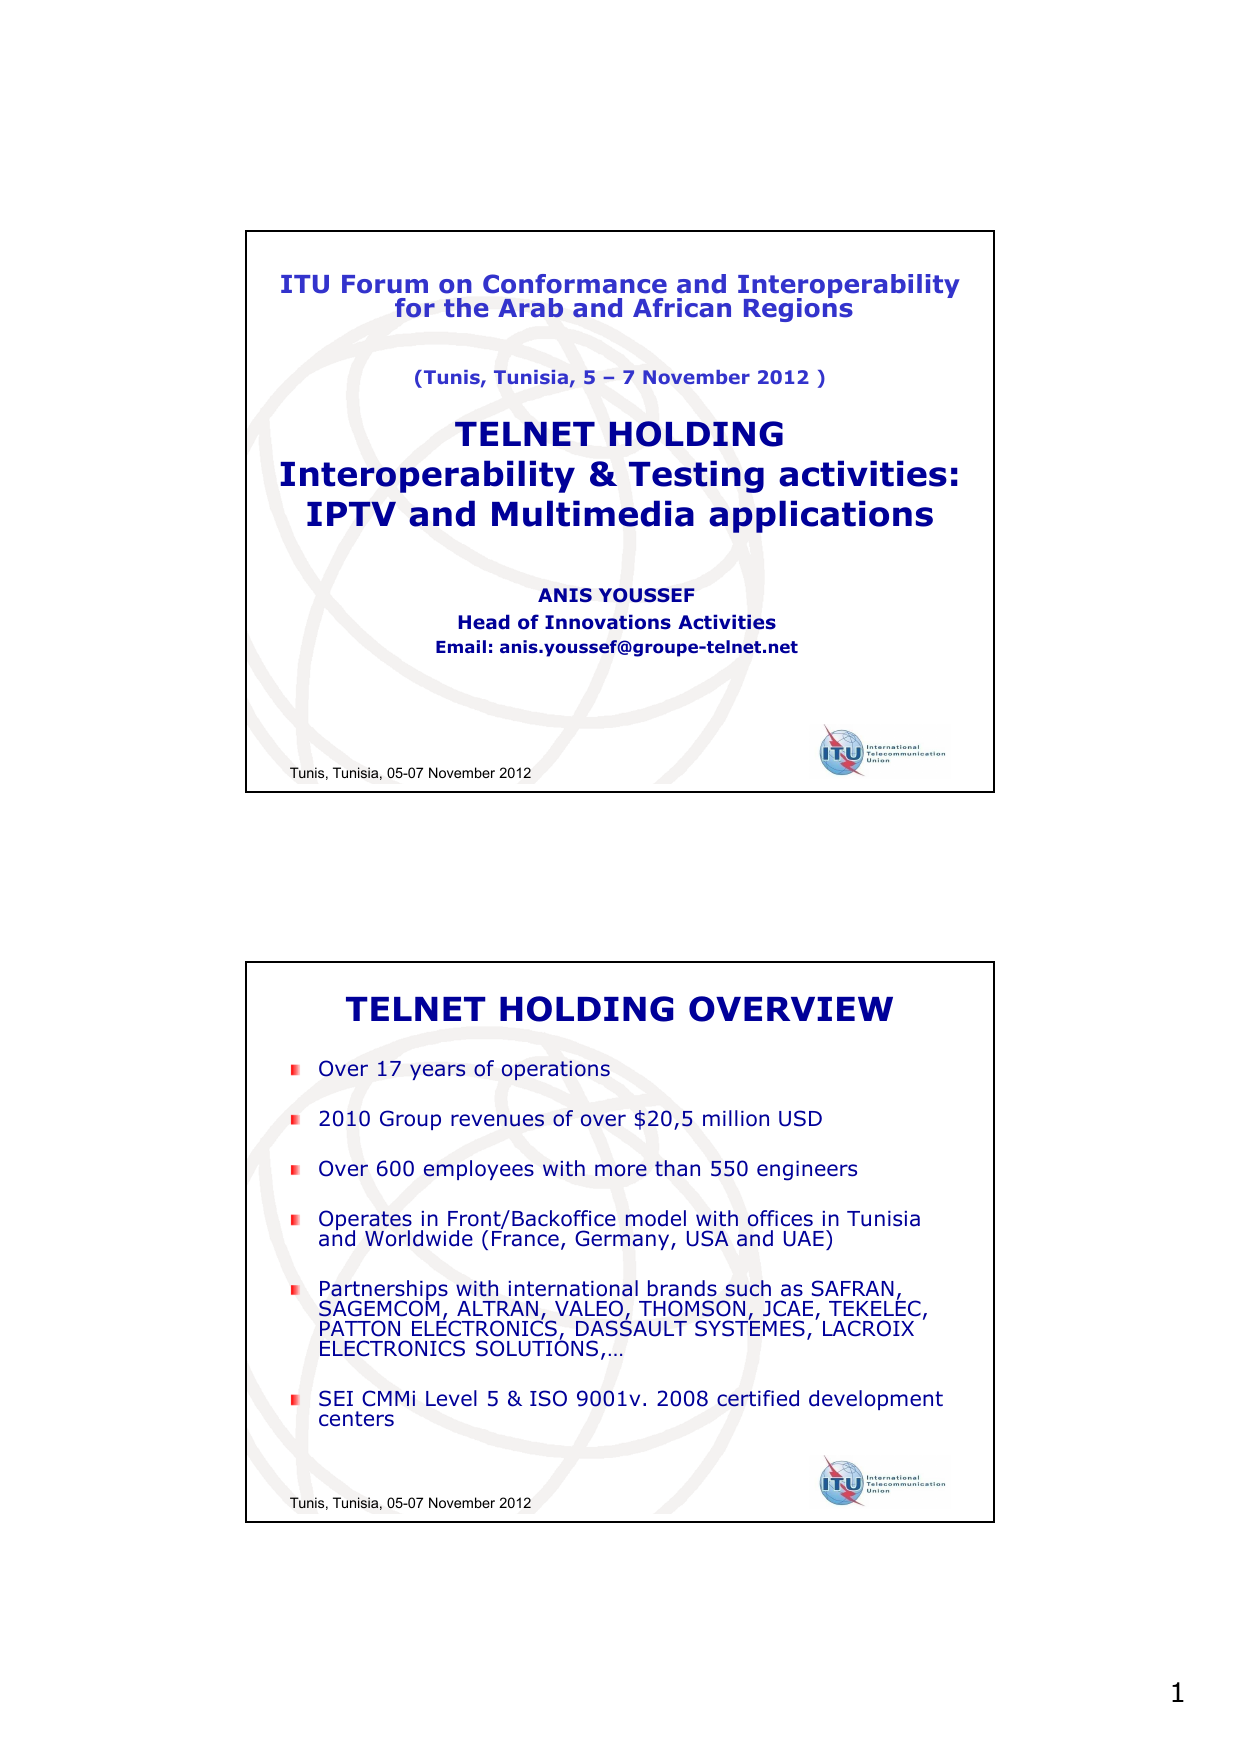 TELNET HOLDING Interoperability & Testing activities: IPTV and